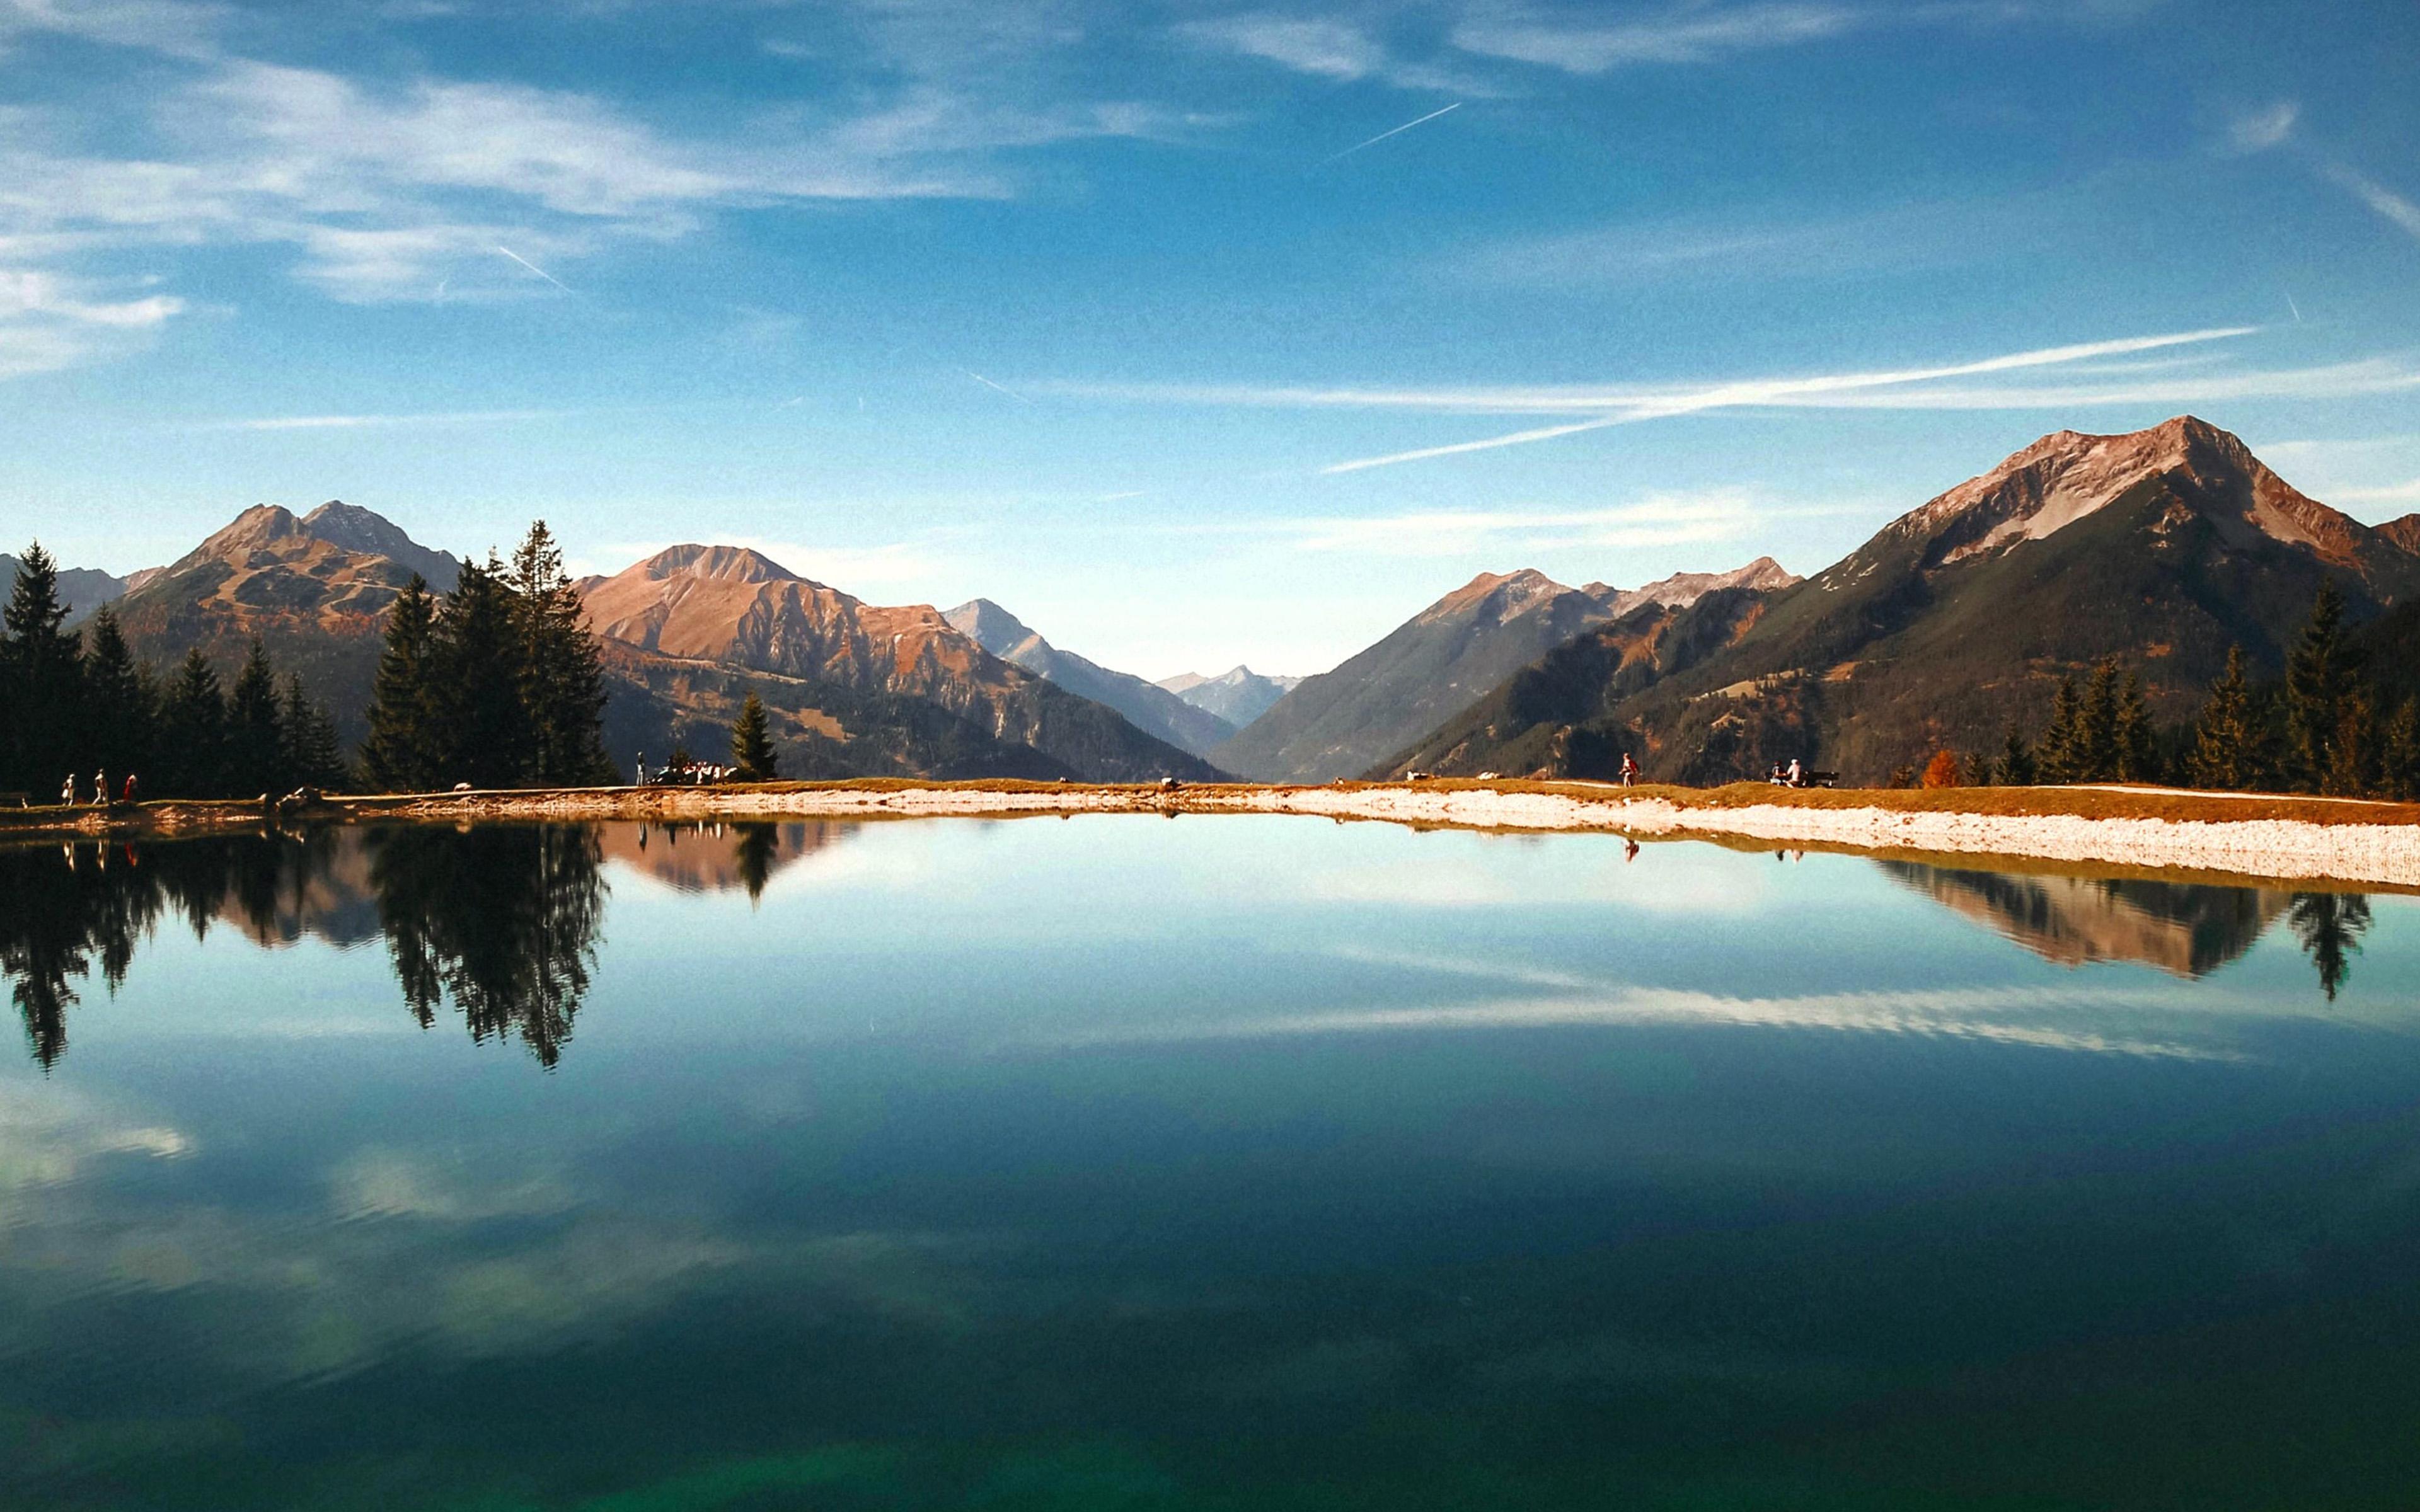 nx48-lake-summer-mountain-nature-wallpaper